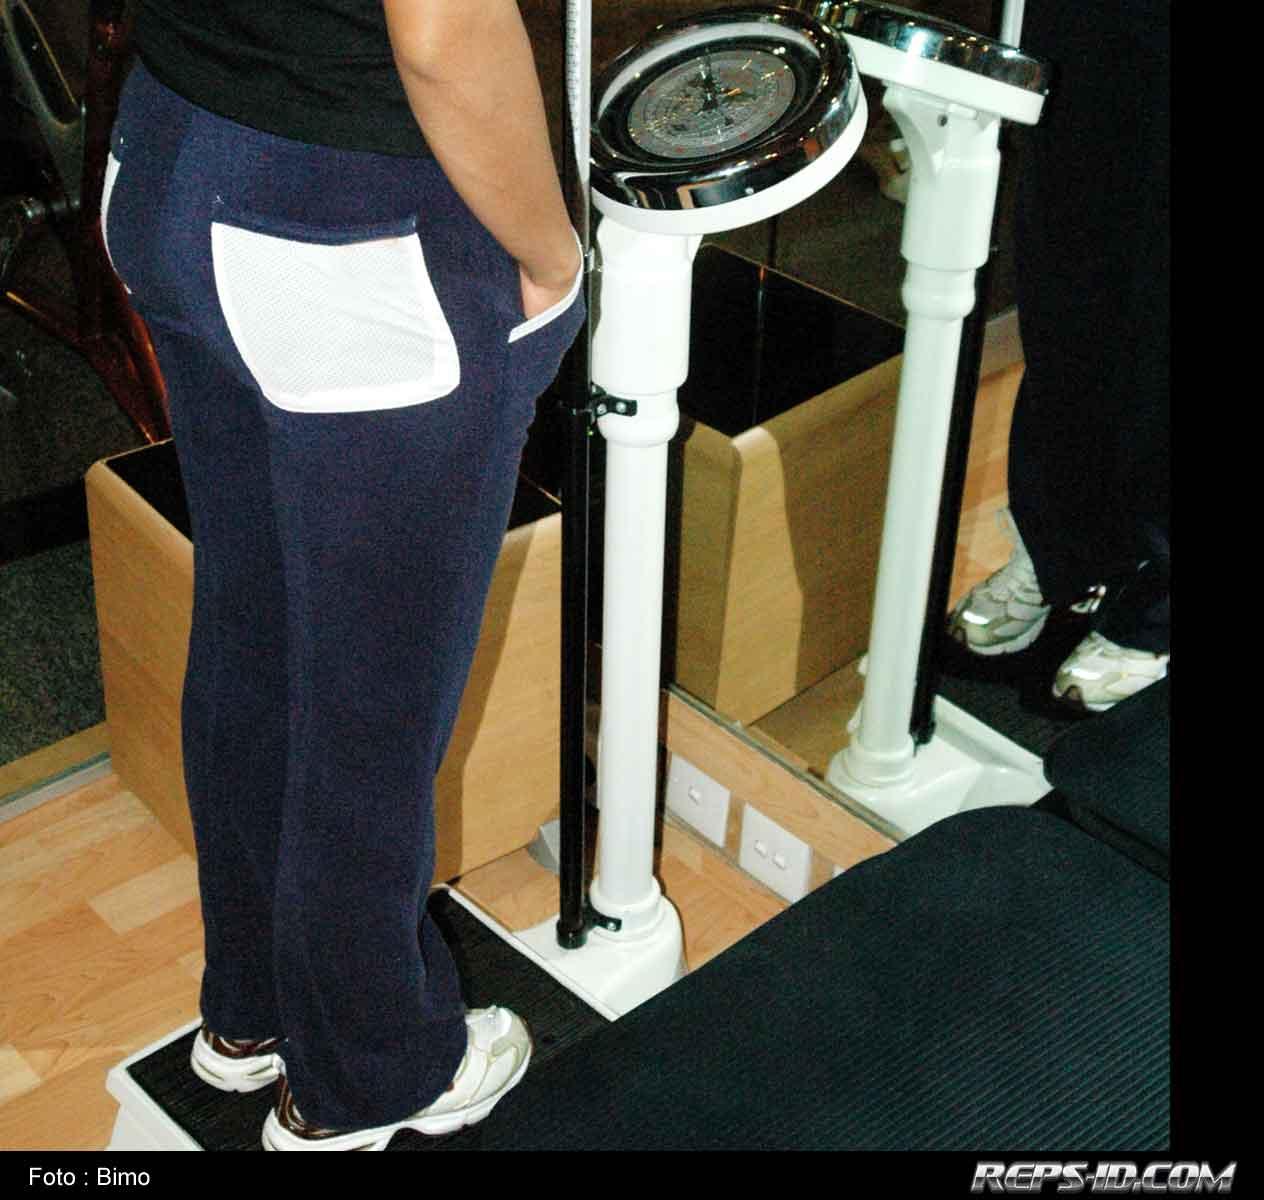 Tabel Ukuran Berat dan Tinggi Badan Ideal